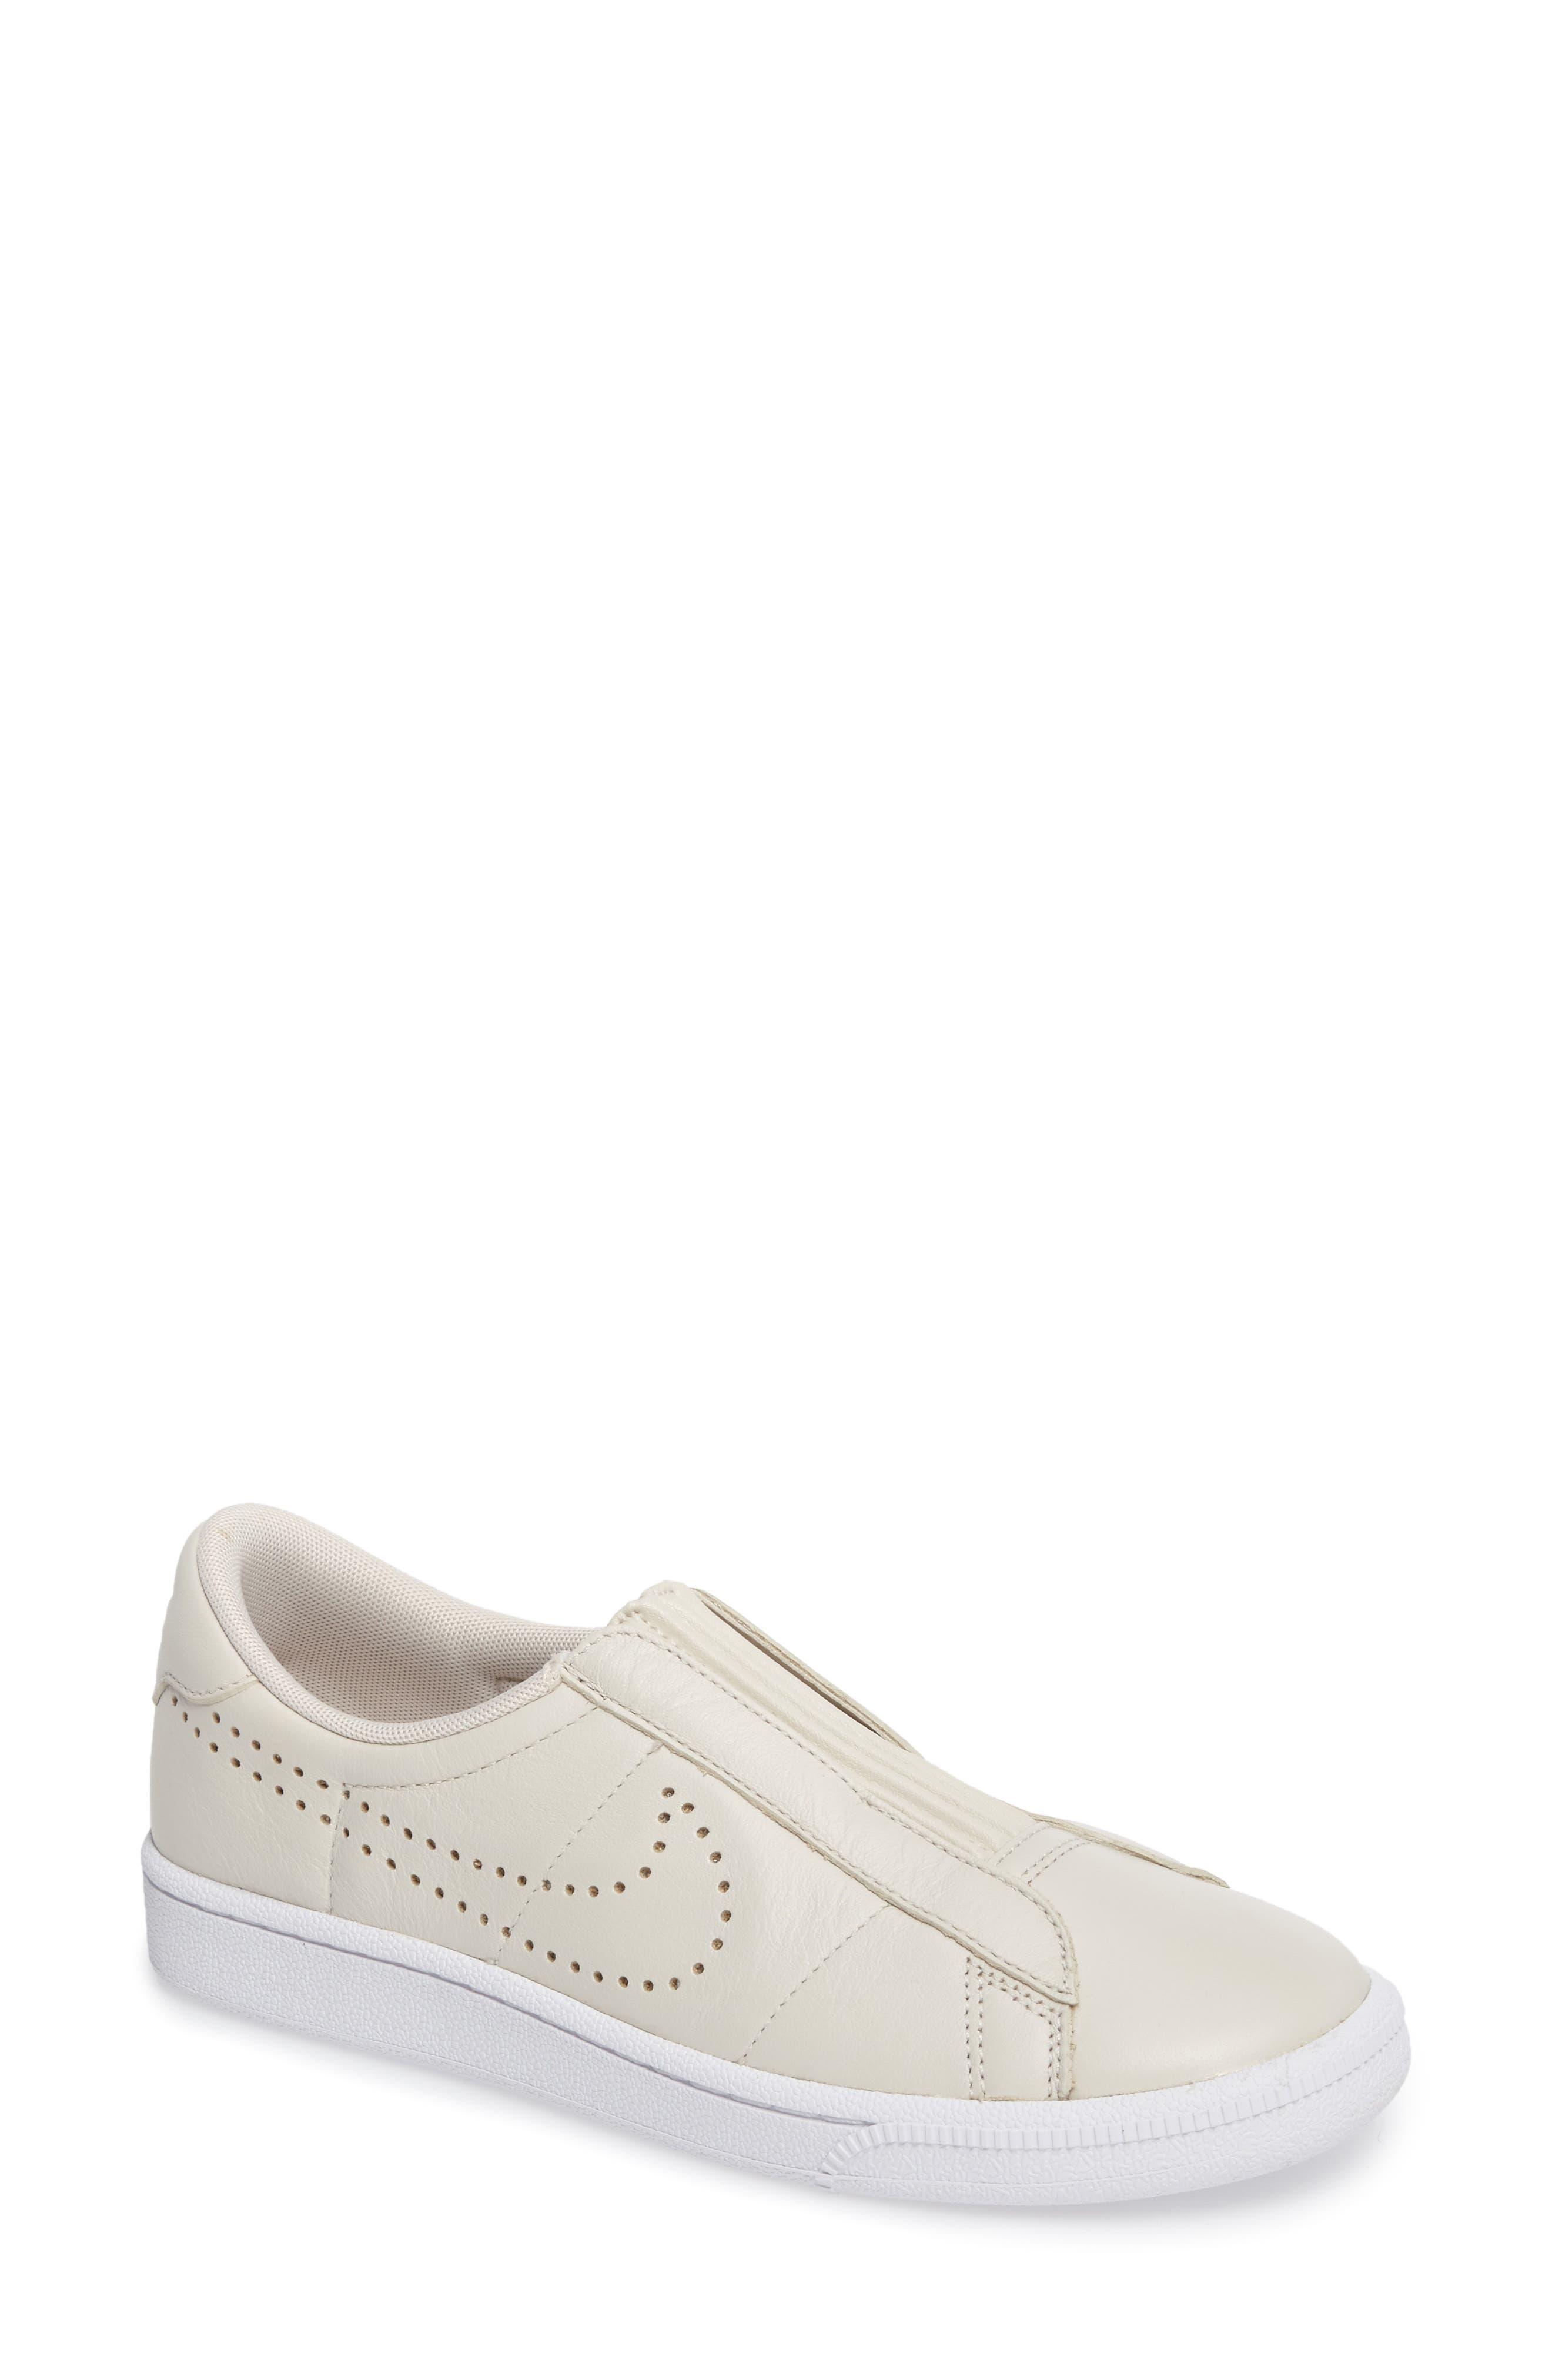 Nike Classic EZ Slip-On Tennis Shoe